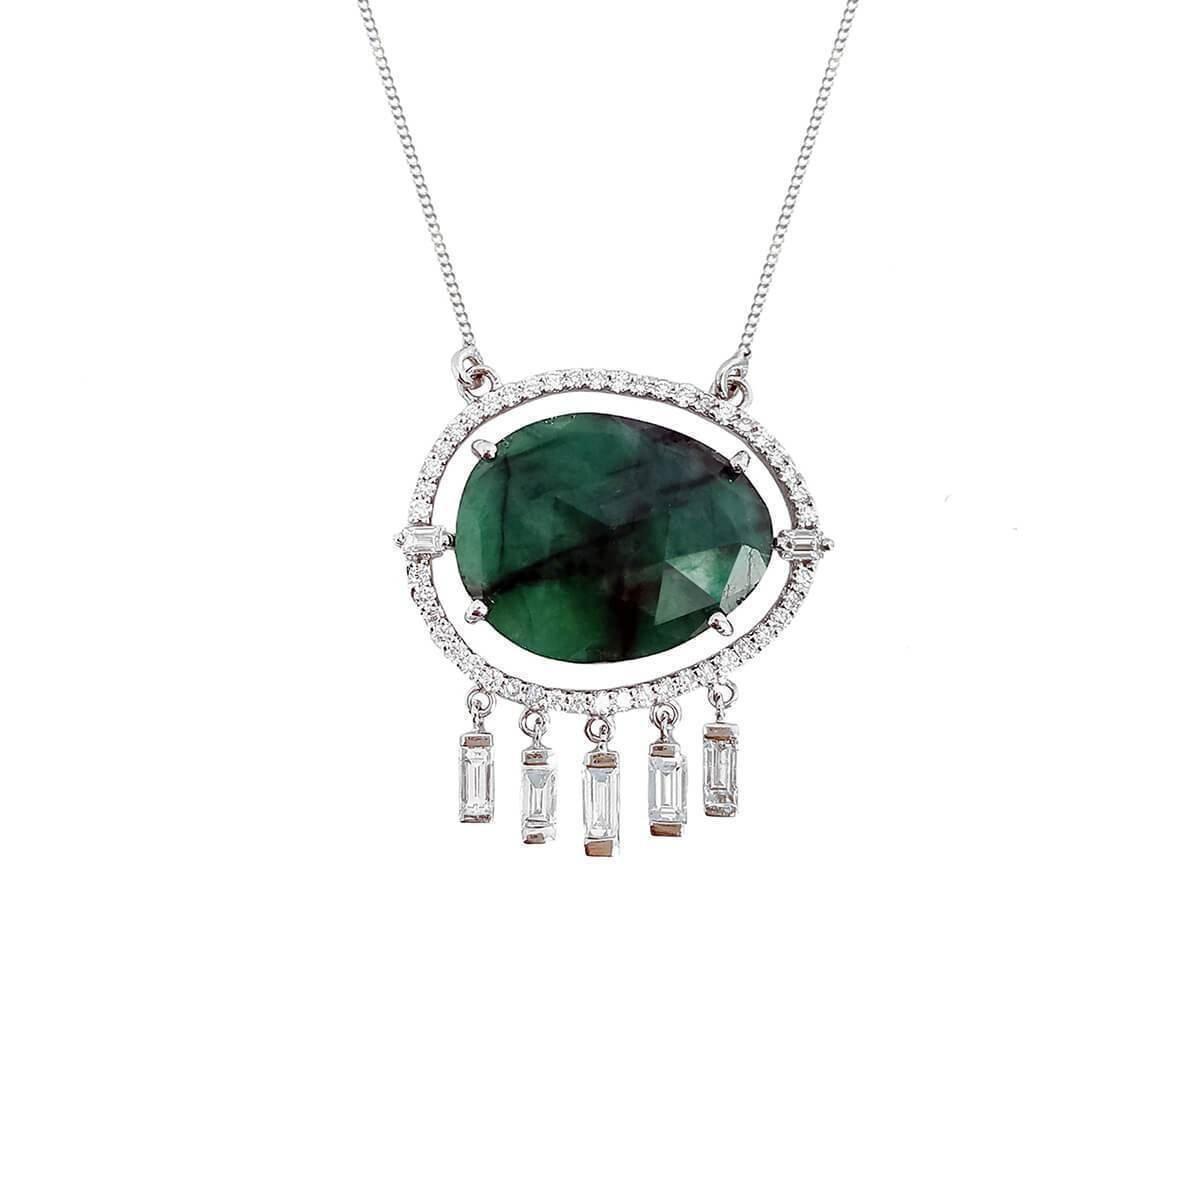 Emerald & Diamond Tassel Necklace